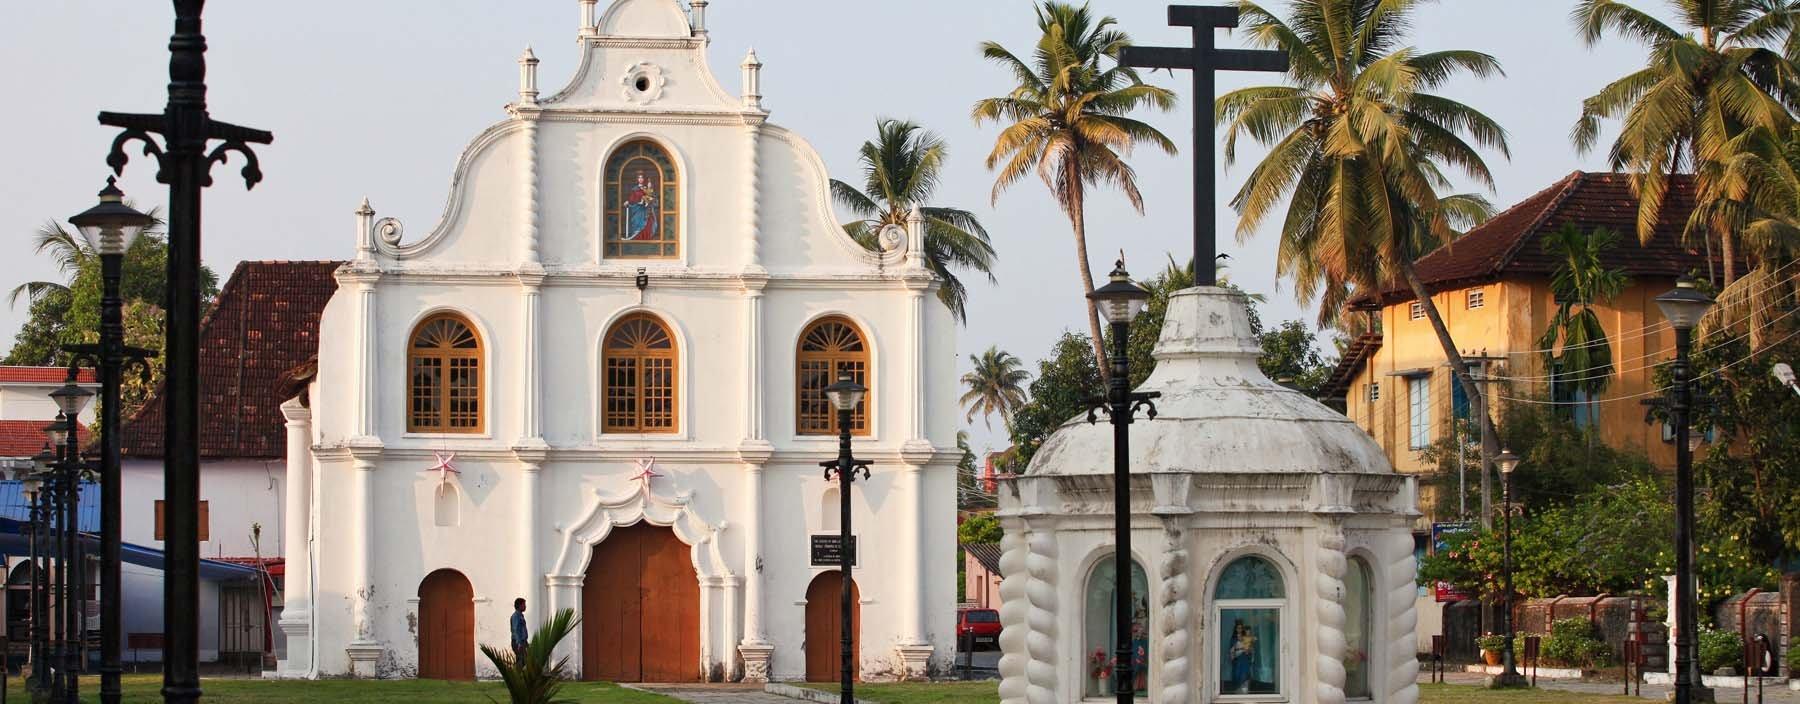 in, cochin, st francis church.jpg